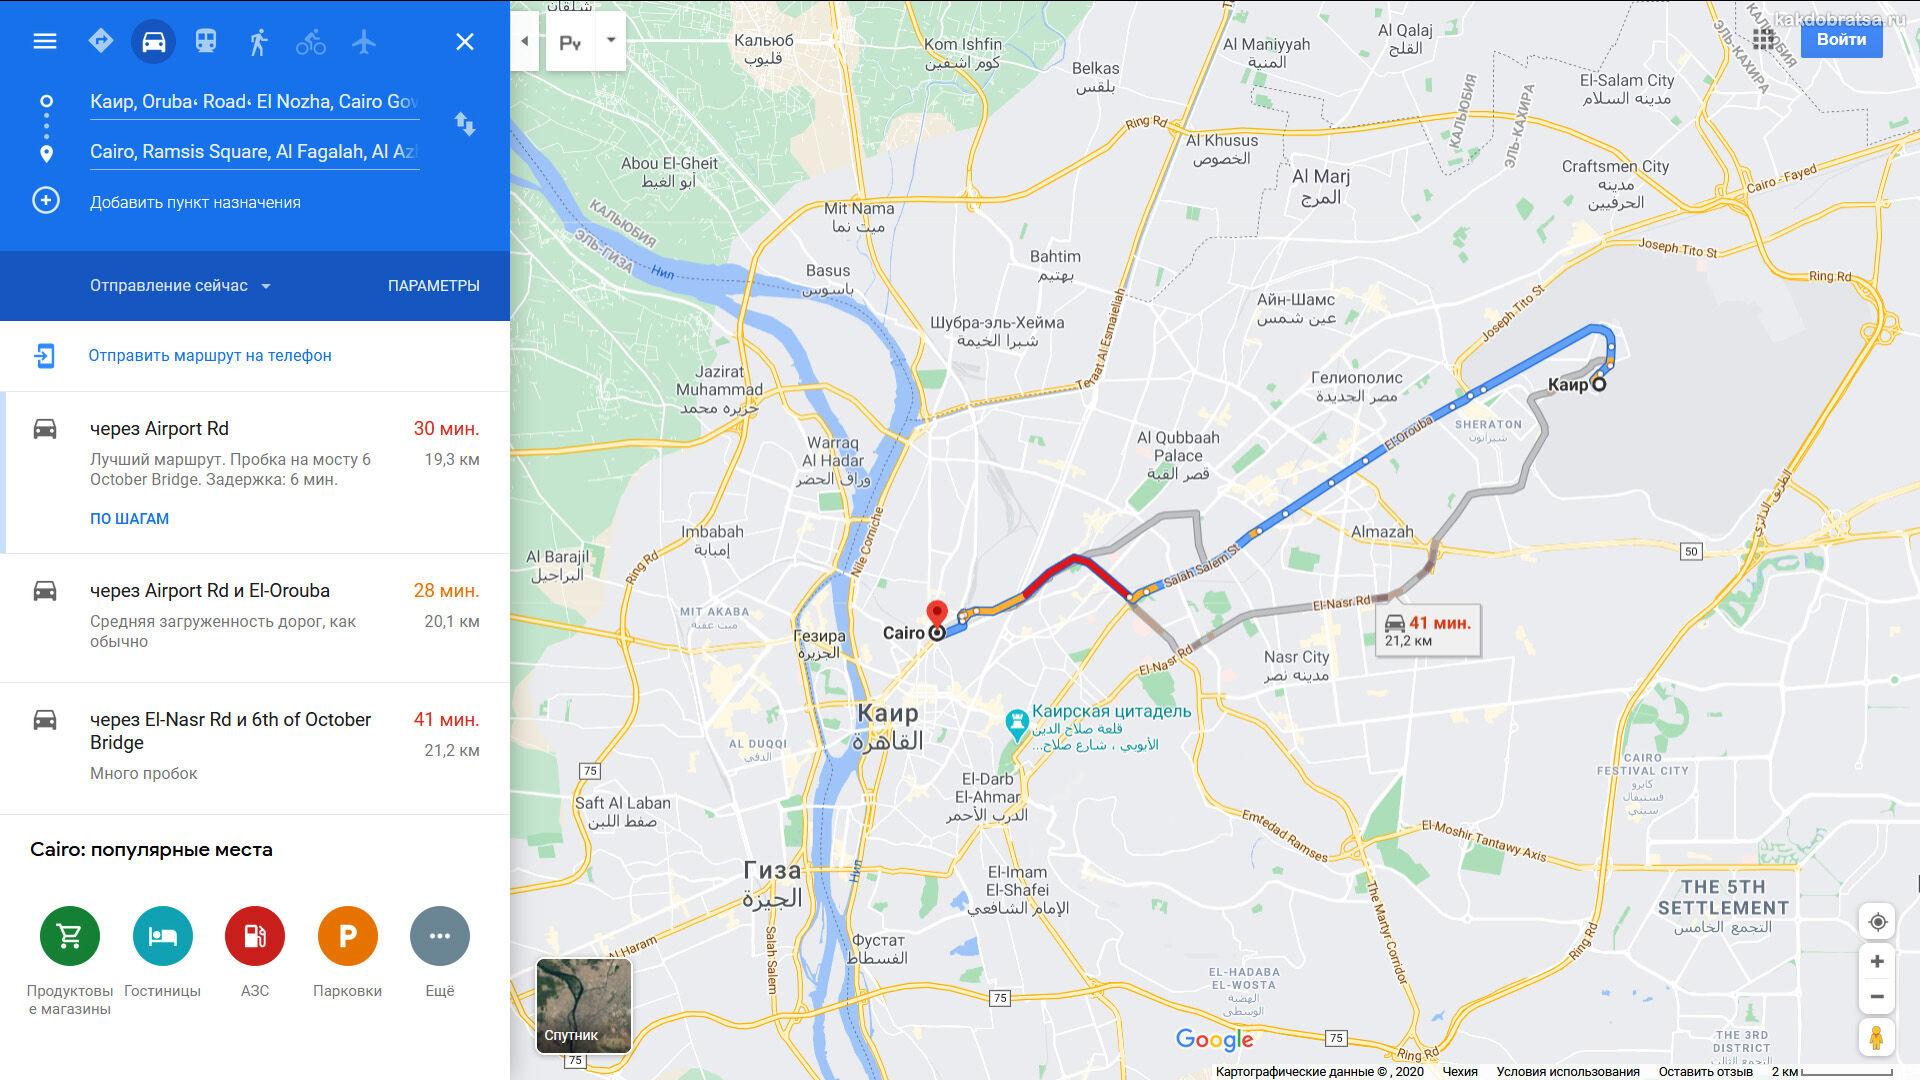 Жд вокзал Каира на карте и расстояние до аэропорта